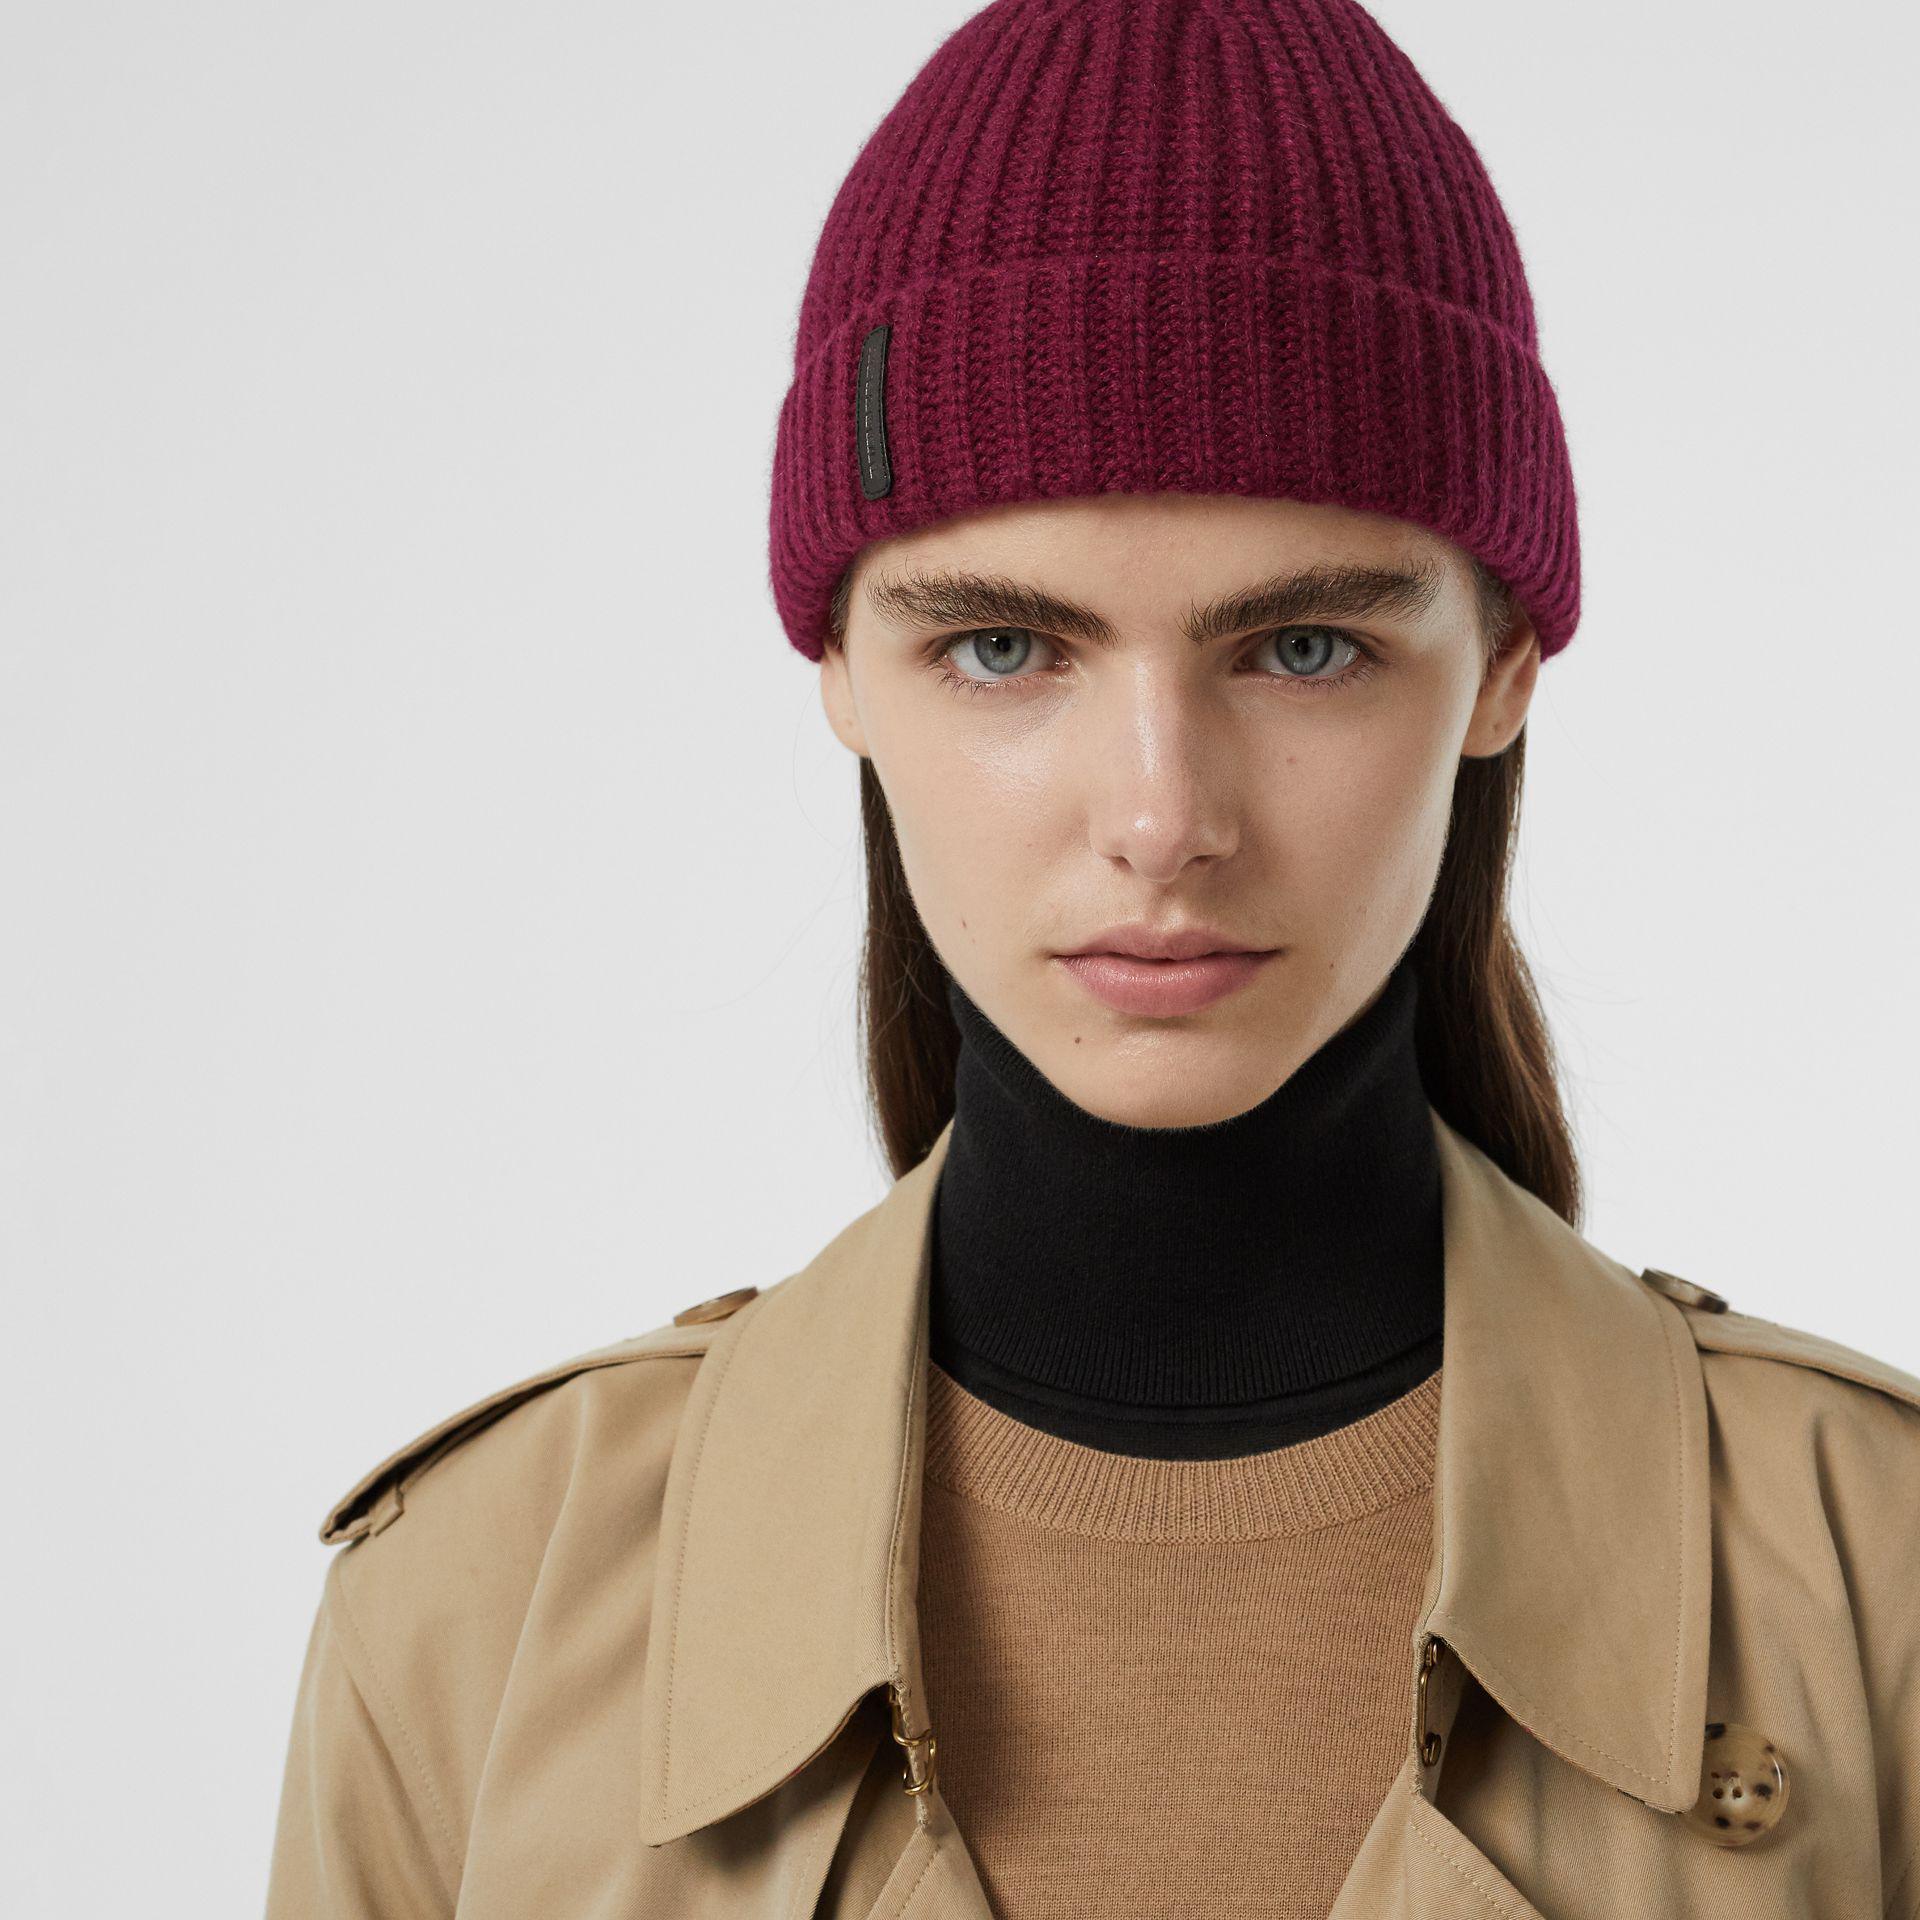 e11e5d11420 Burberry - Multicolor Rib Knit Cashmere Beanie for Men - Lyst. View  fullscreen